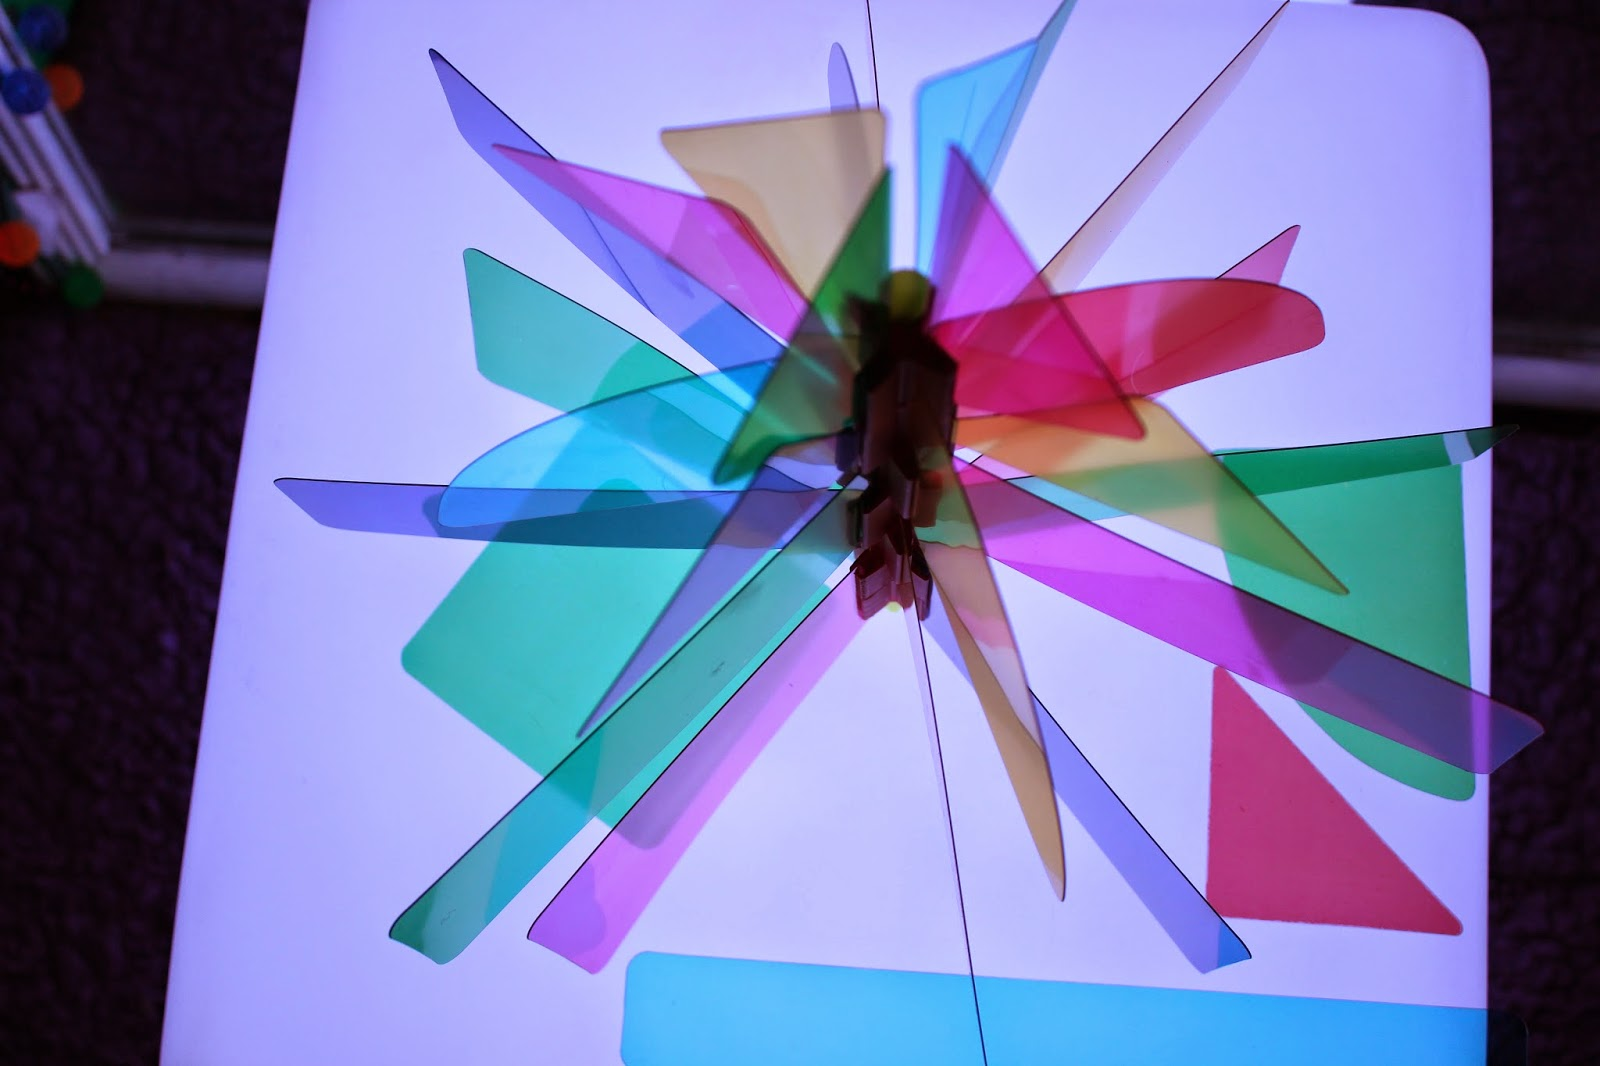 Roylco light cube